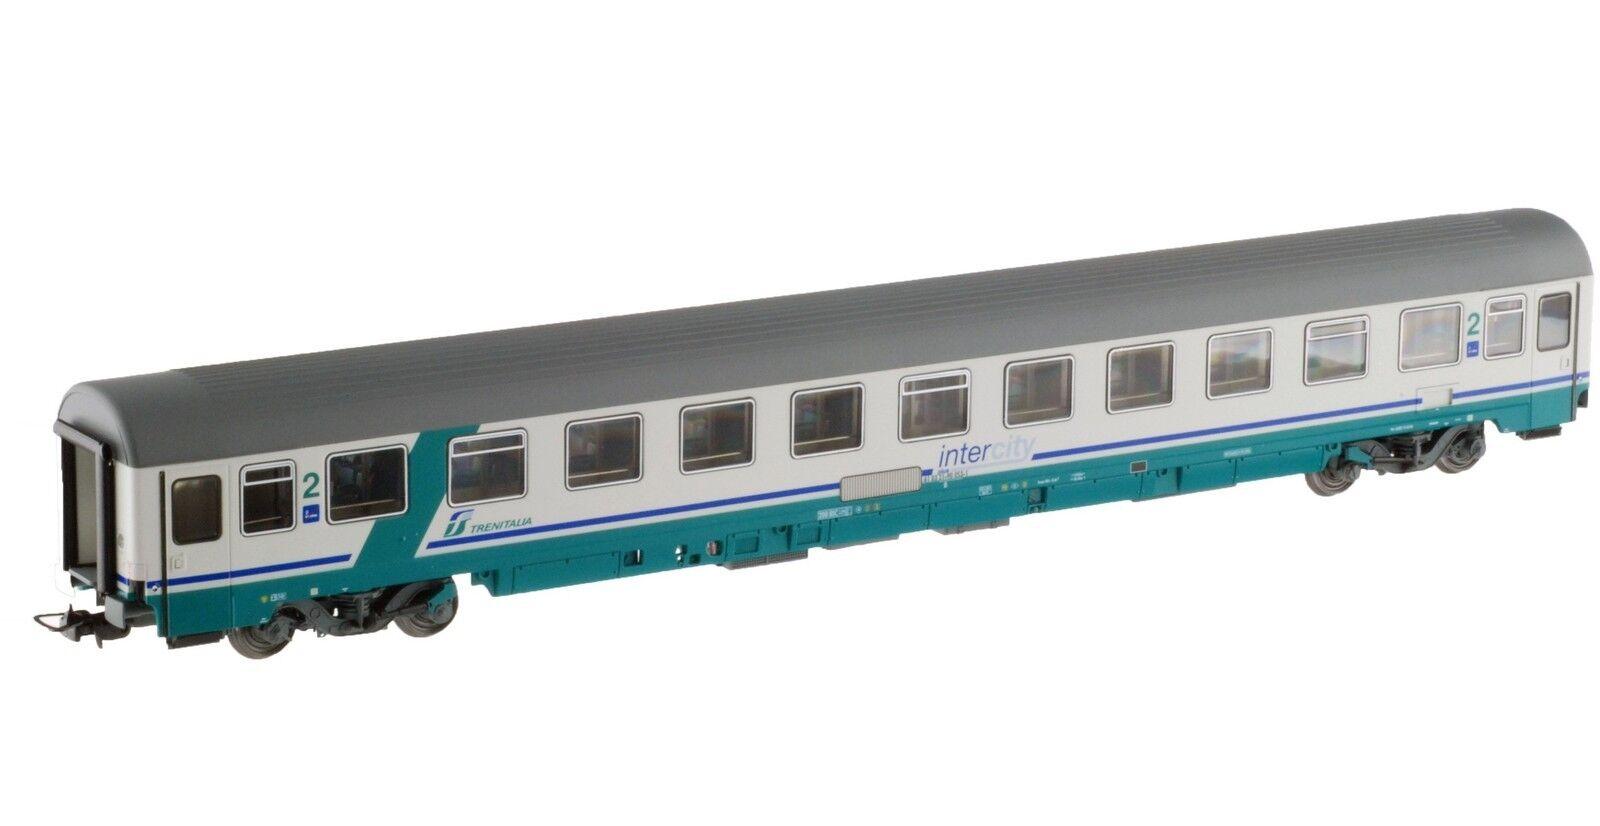 LS Models 47461 FS EUROFIMA 2.kl - WG b11 intercit XMPR BEIG/Blu/Verde ep5 NUOVO + OVP